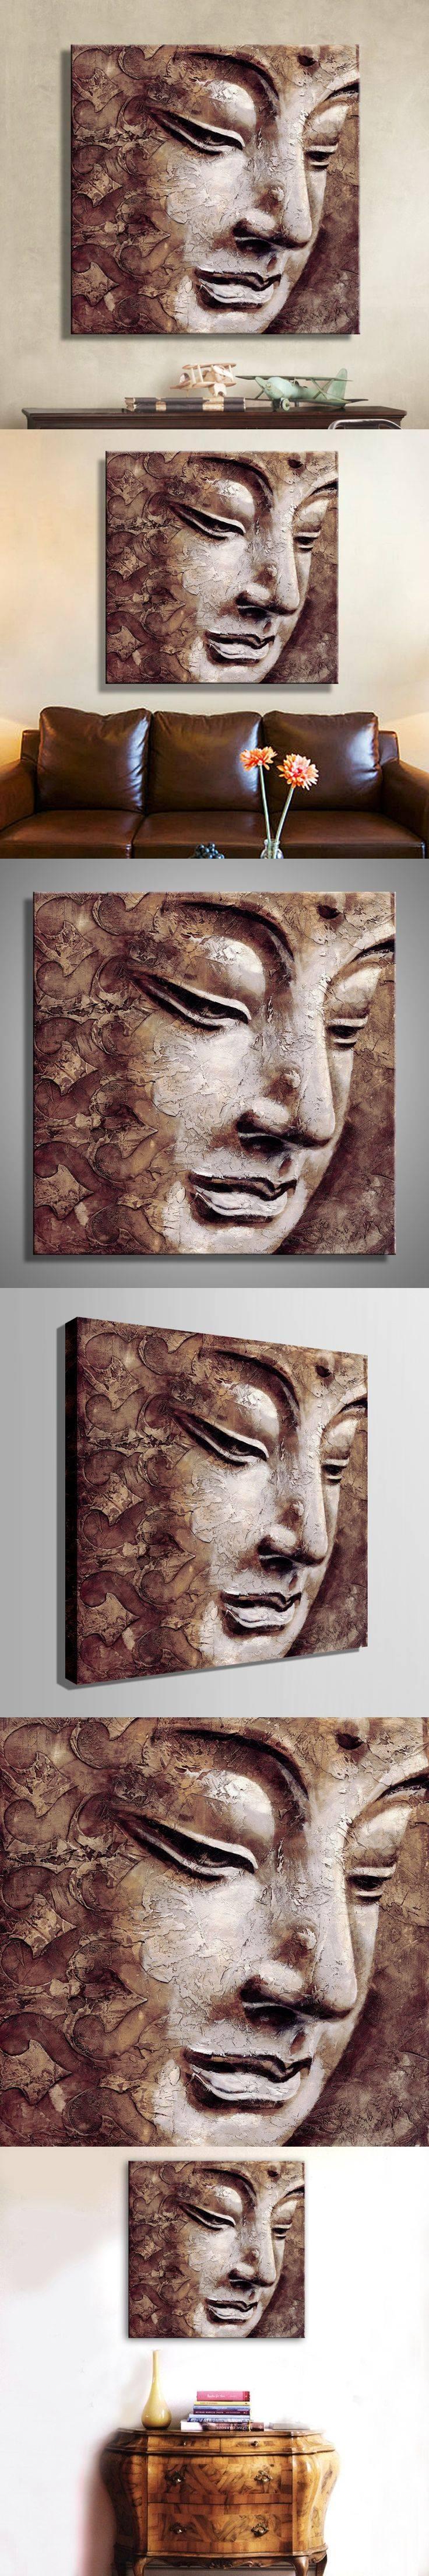 Best 25+ Buddha Wall Art Ideas On Pinterest | Yoga Rooms, Yoga Inside Most Recent 3D Buddha Wall Art (View 4 of 20)